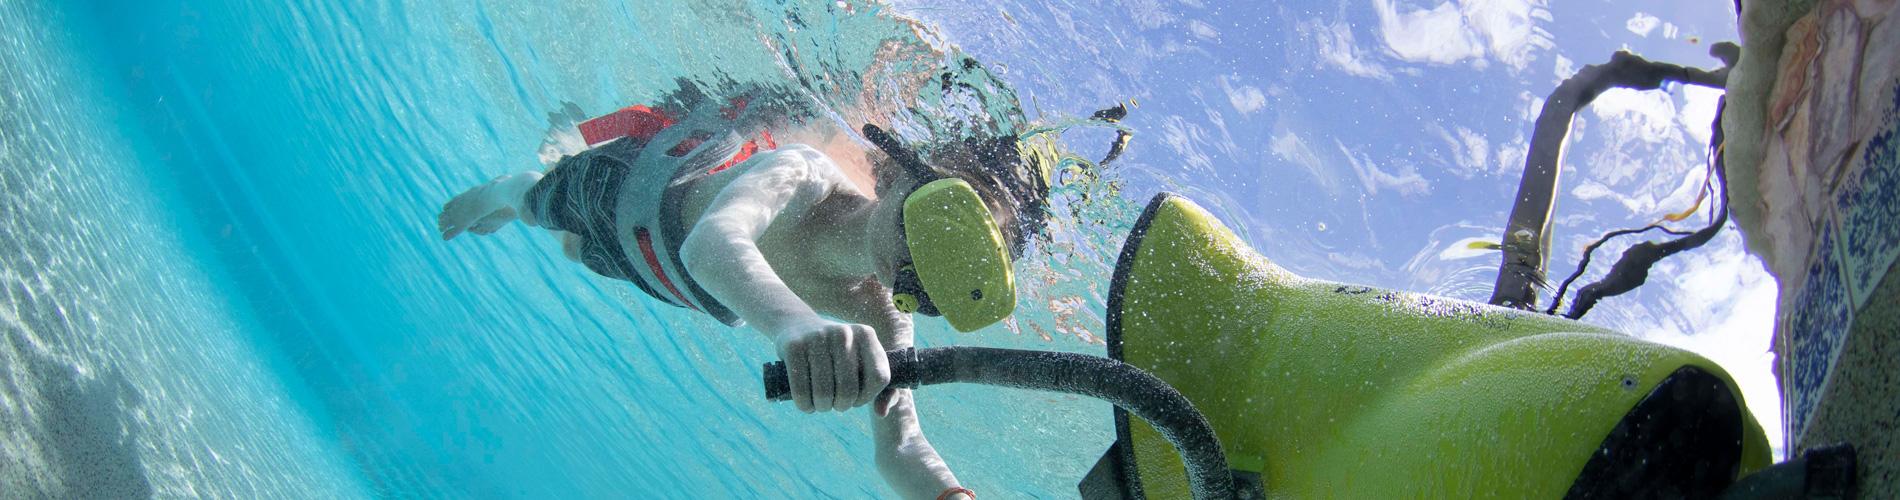 Boy Experiencing Virtual Reality Snorkeling